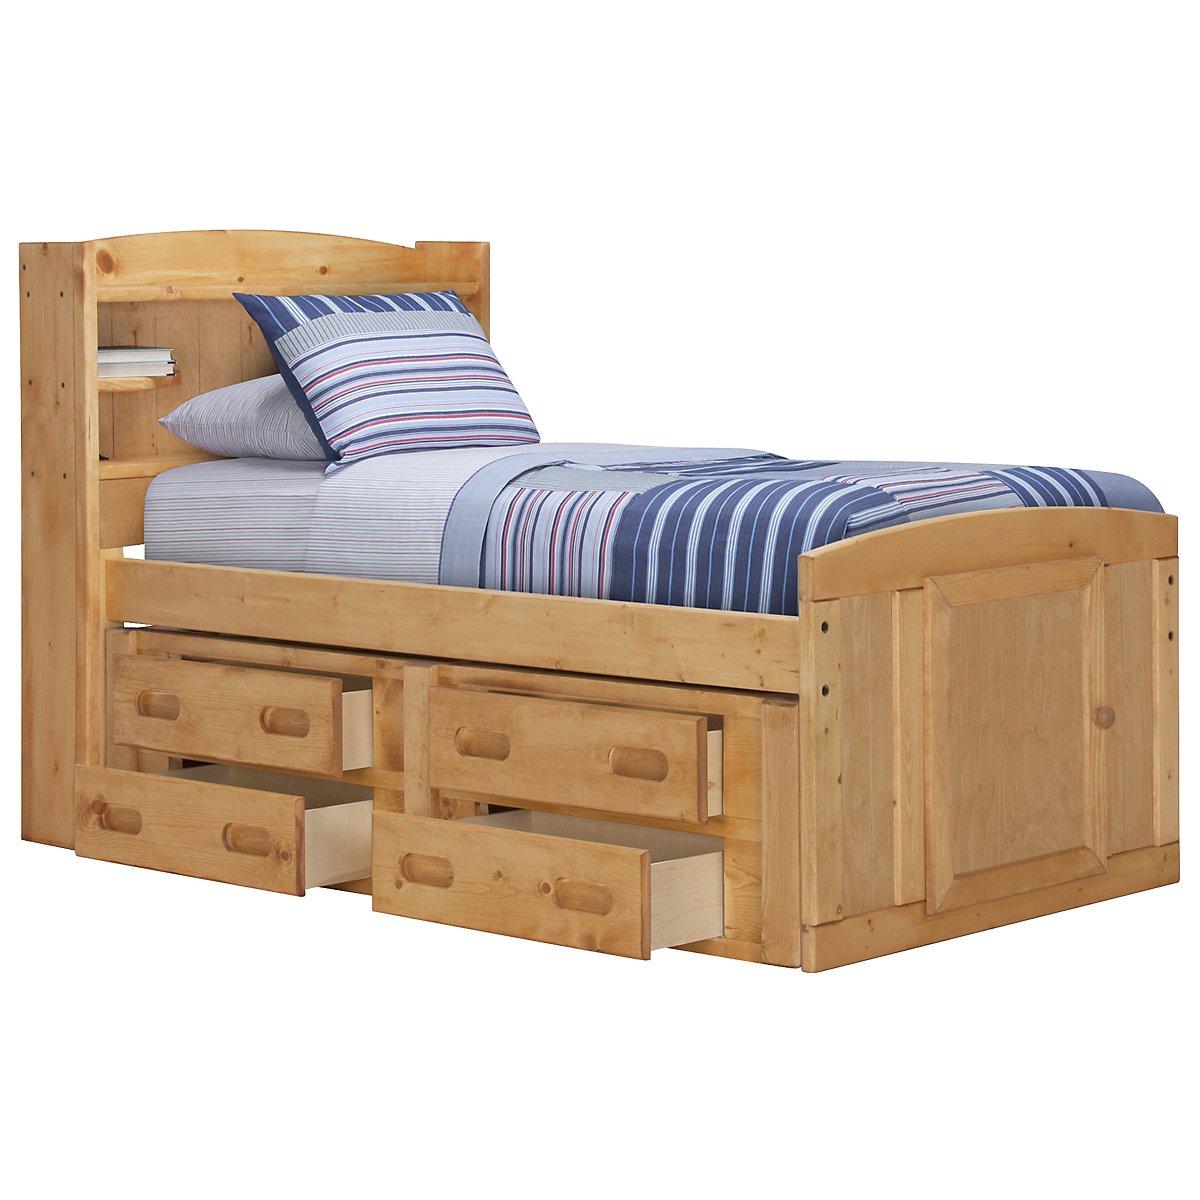 ebay platform bookcase prepac double full monterey storage bed bookcases bhp white